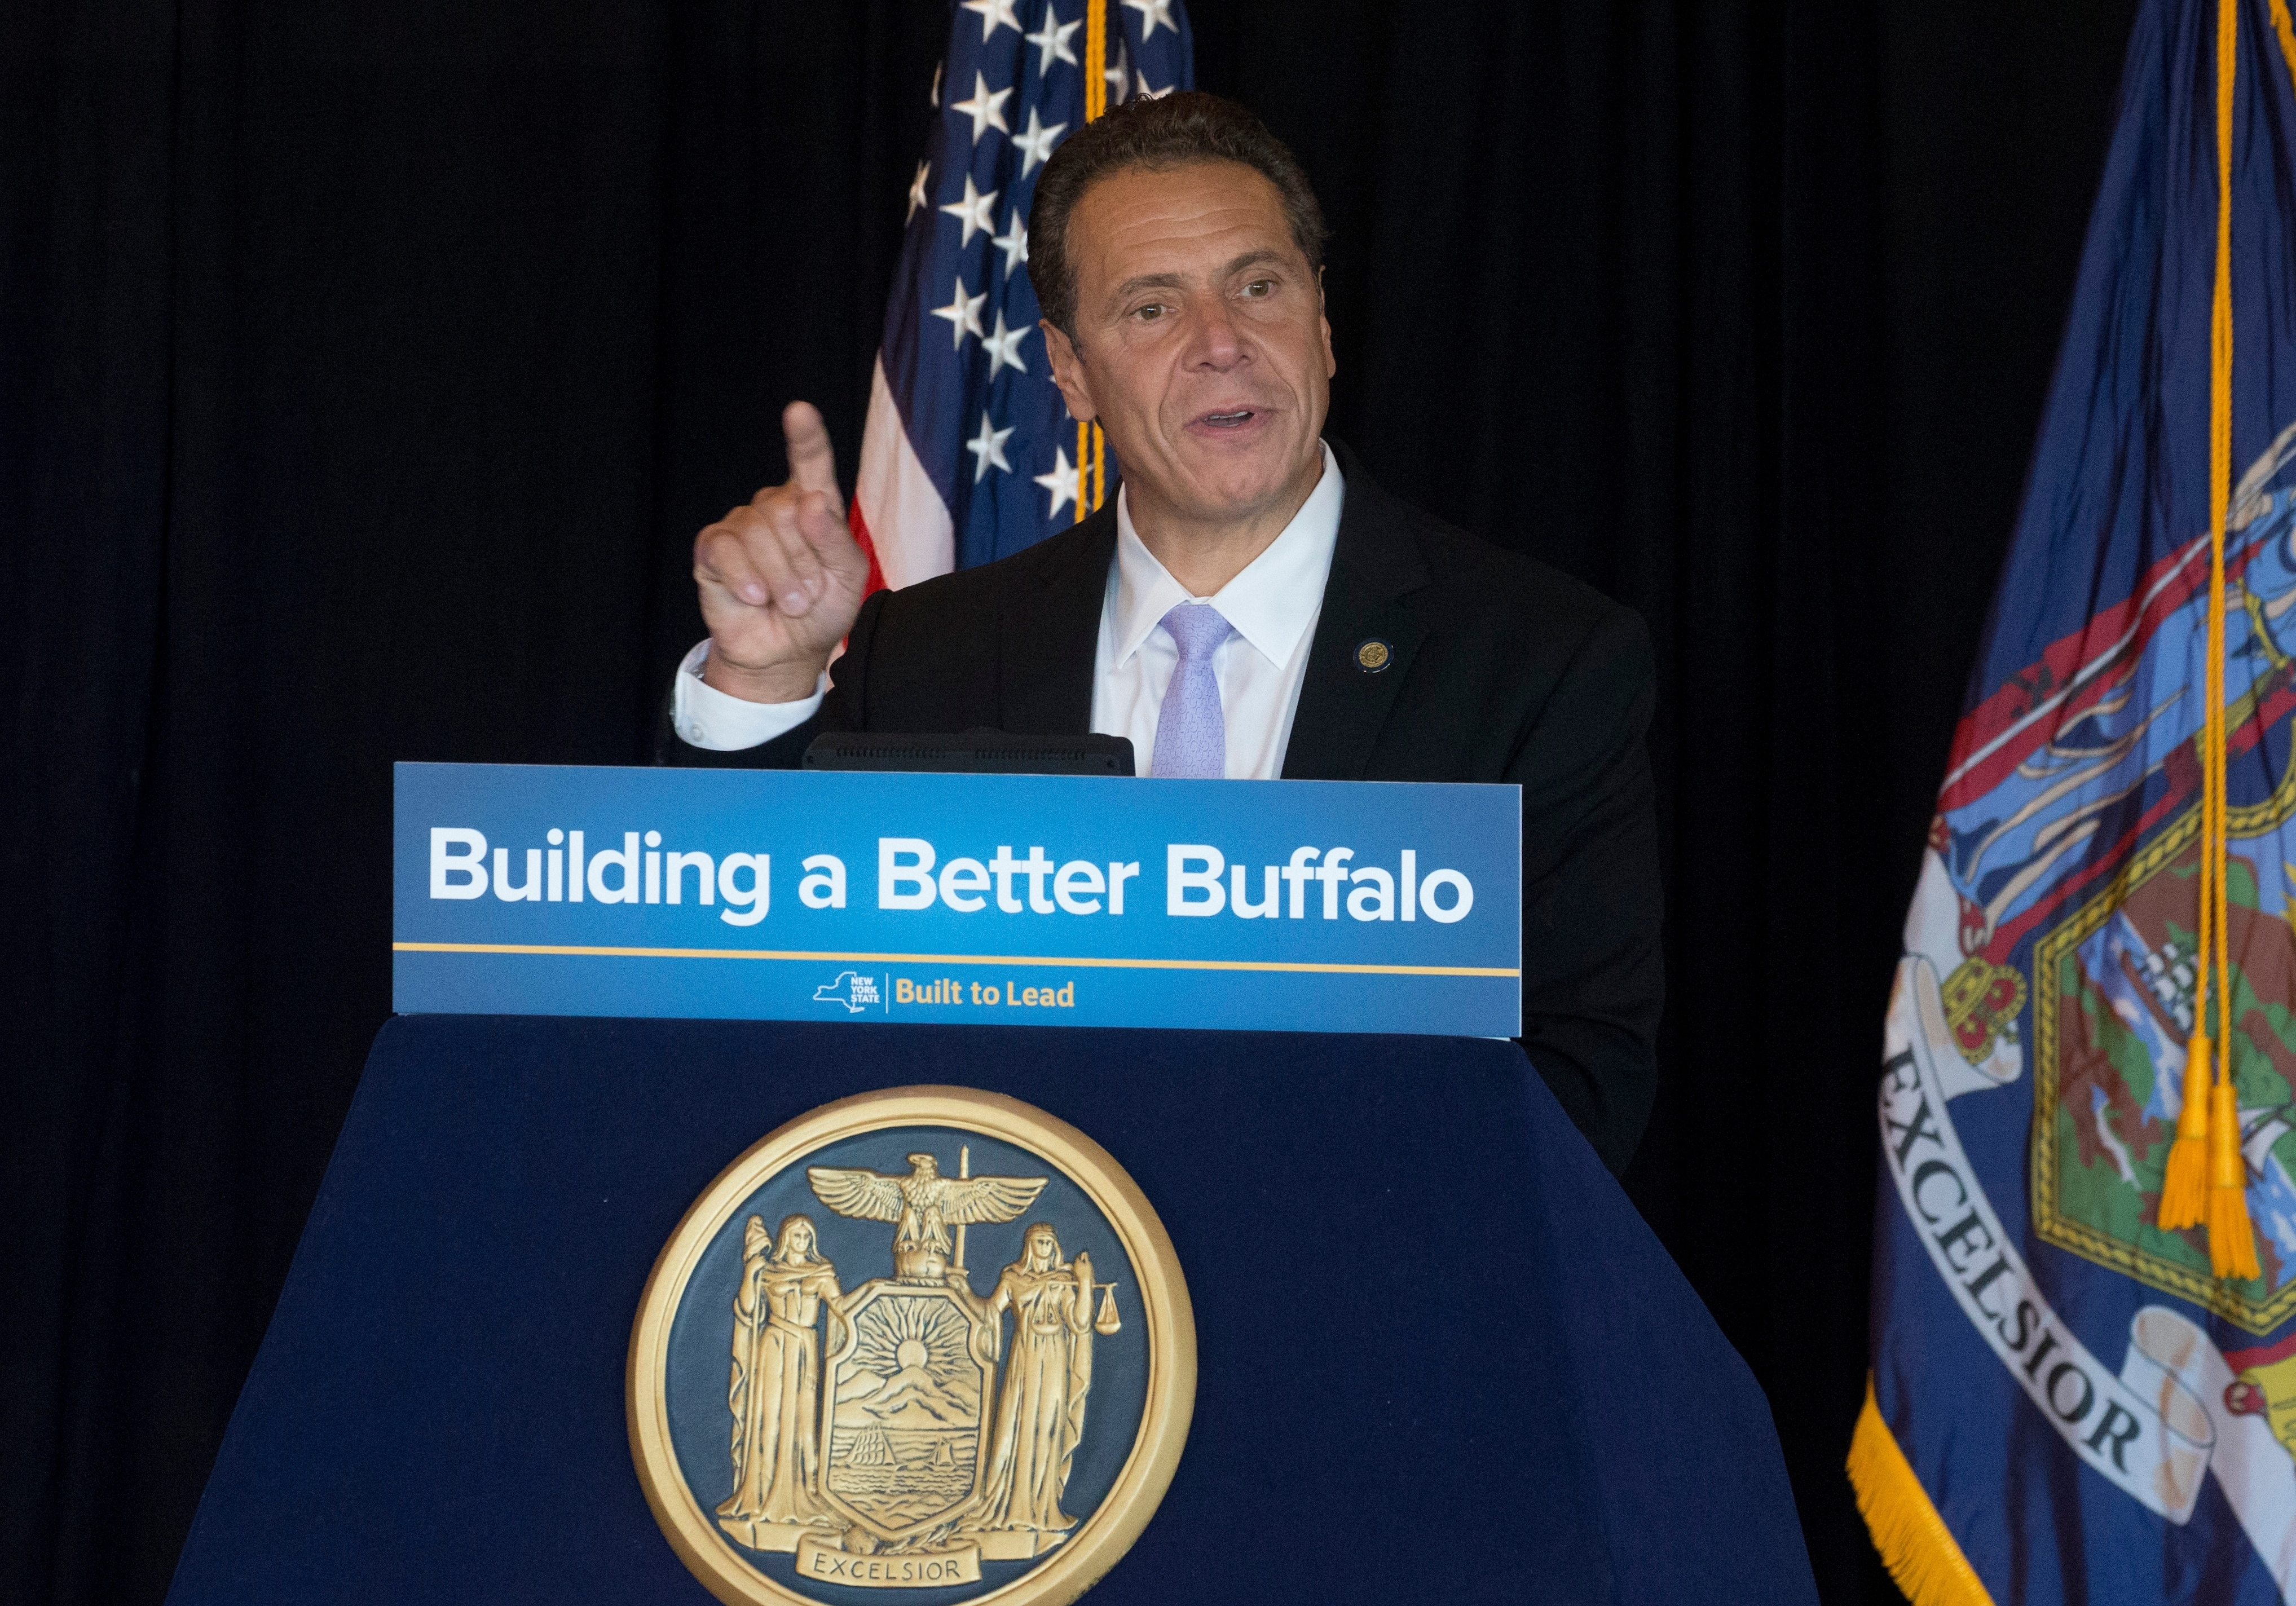 Gov. Cuomo said the budget extender includes funding for the Buffalo Billion II economic development program. (John Hickey/Buffalo News)